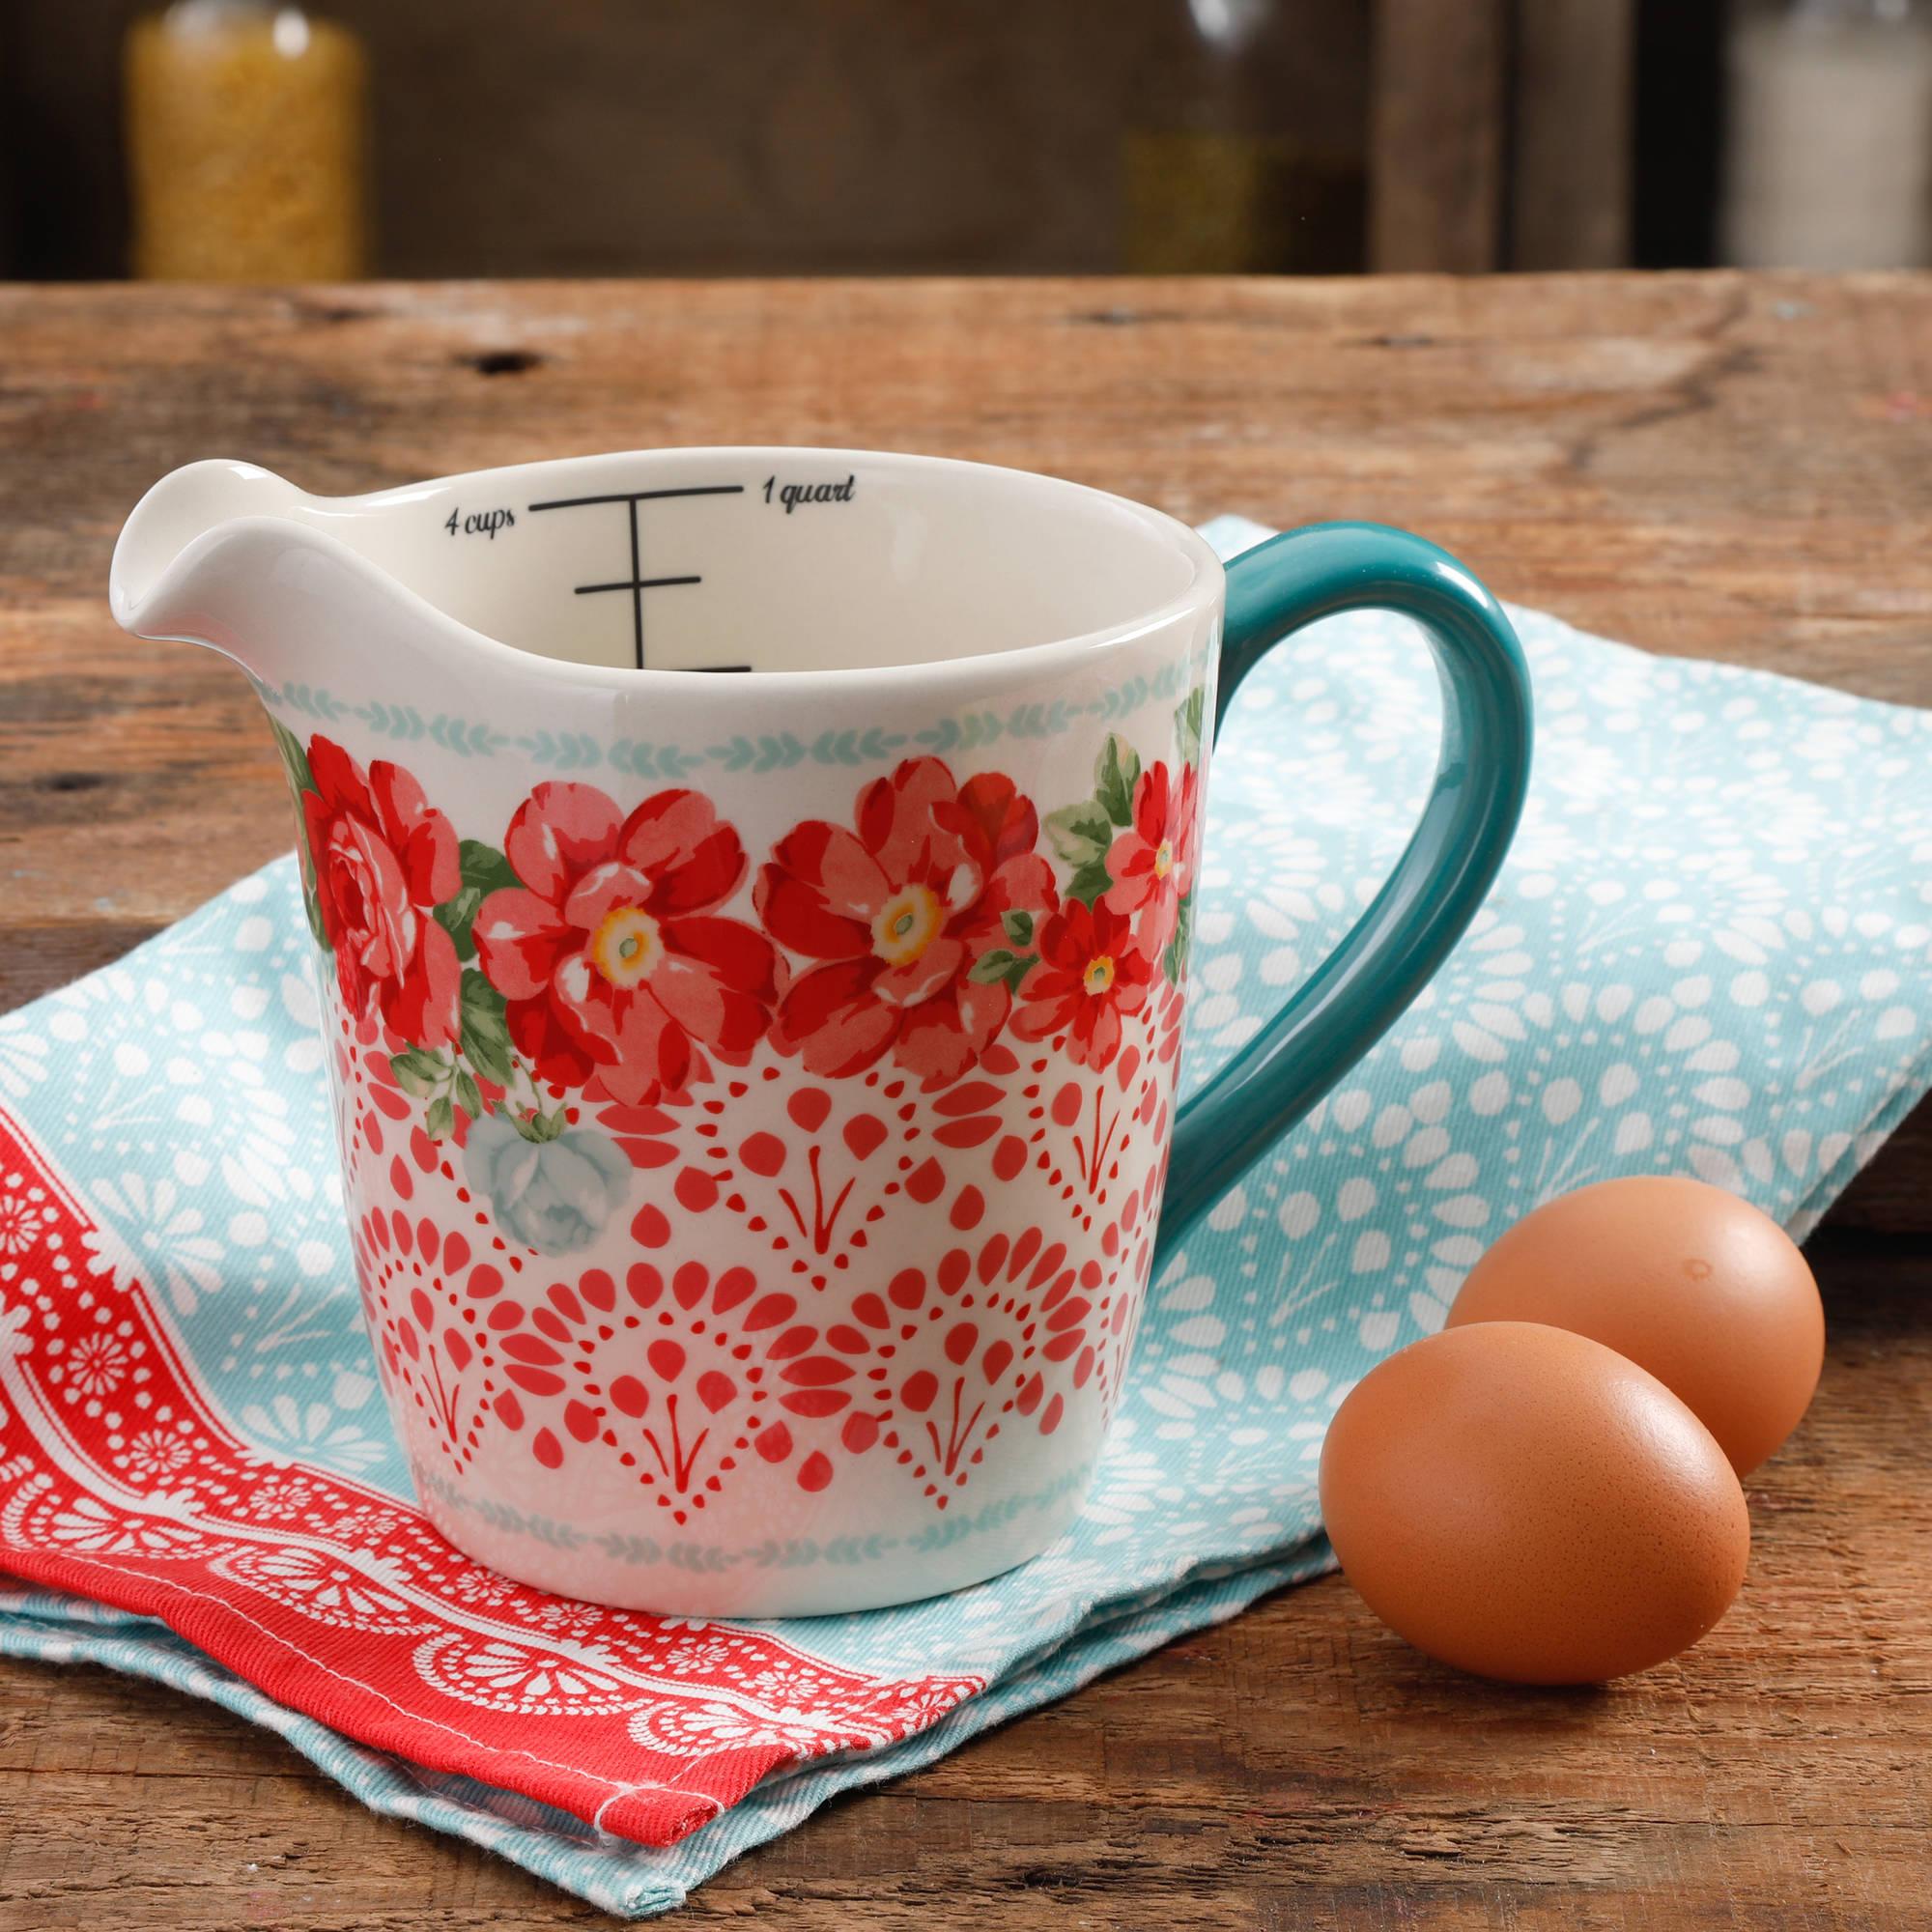 The Pioneer Woman 4 Cup Vintage Floral Measuring Cup, 1 Each